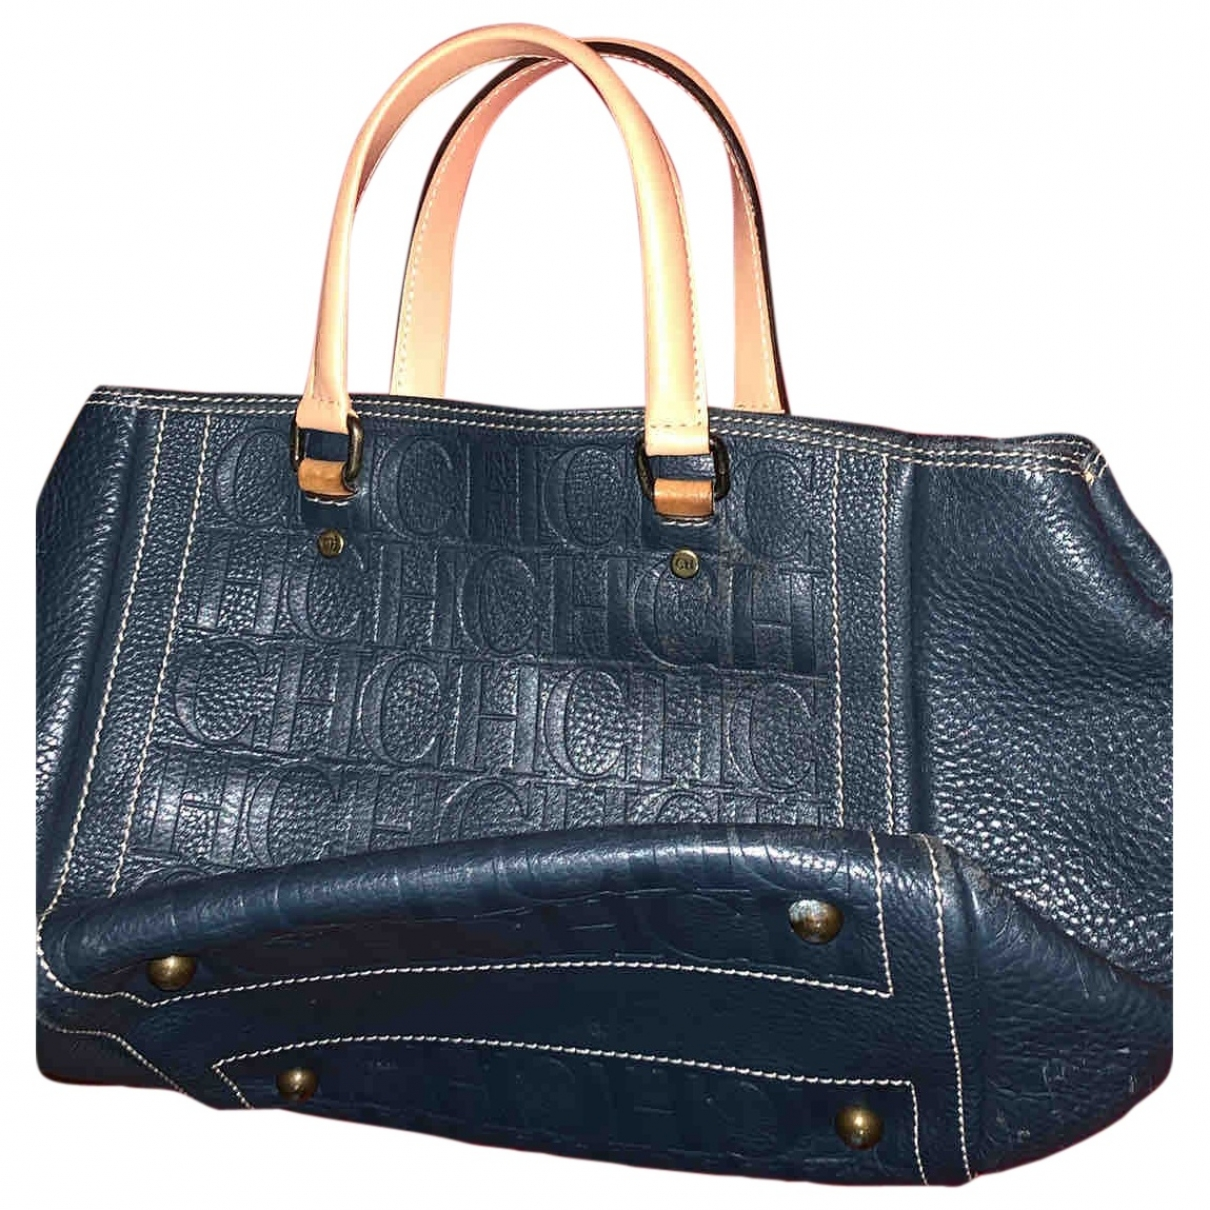 Carolina Herrera \N Blue Leather handbag for Women \N